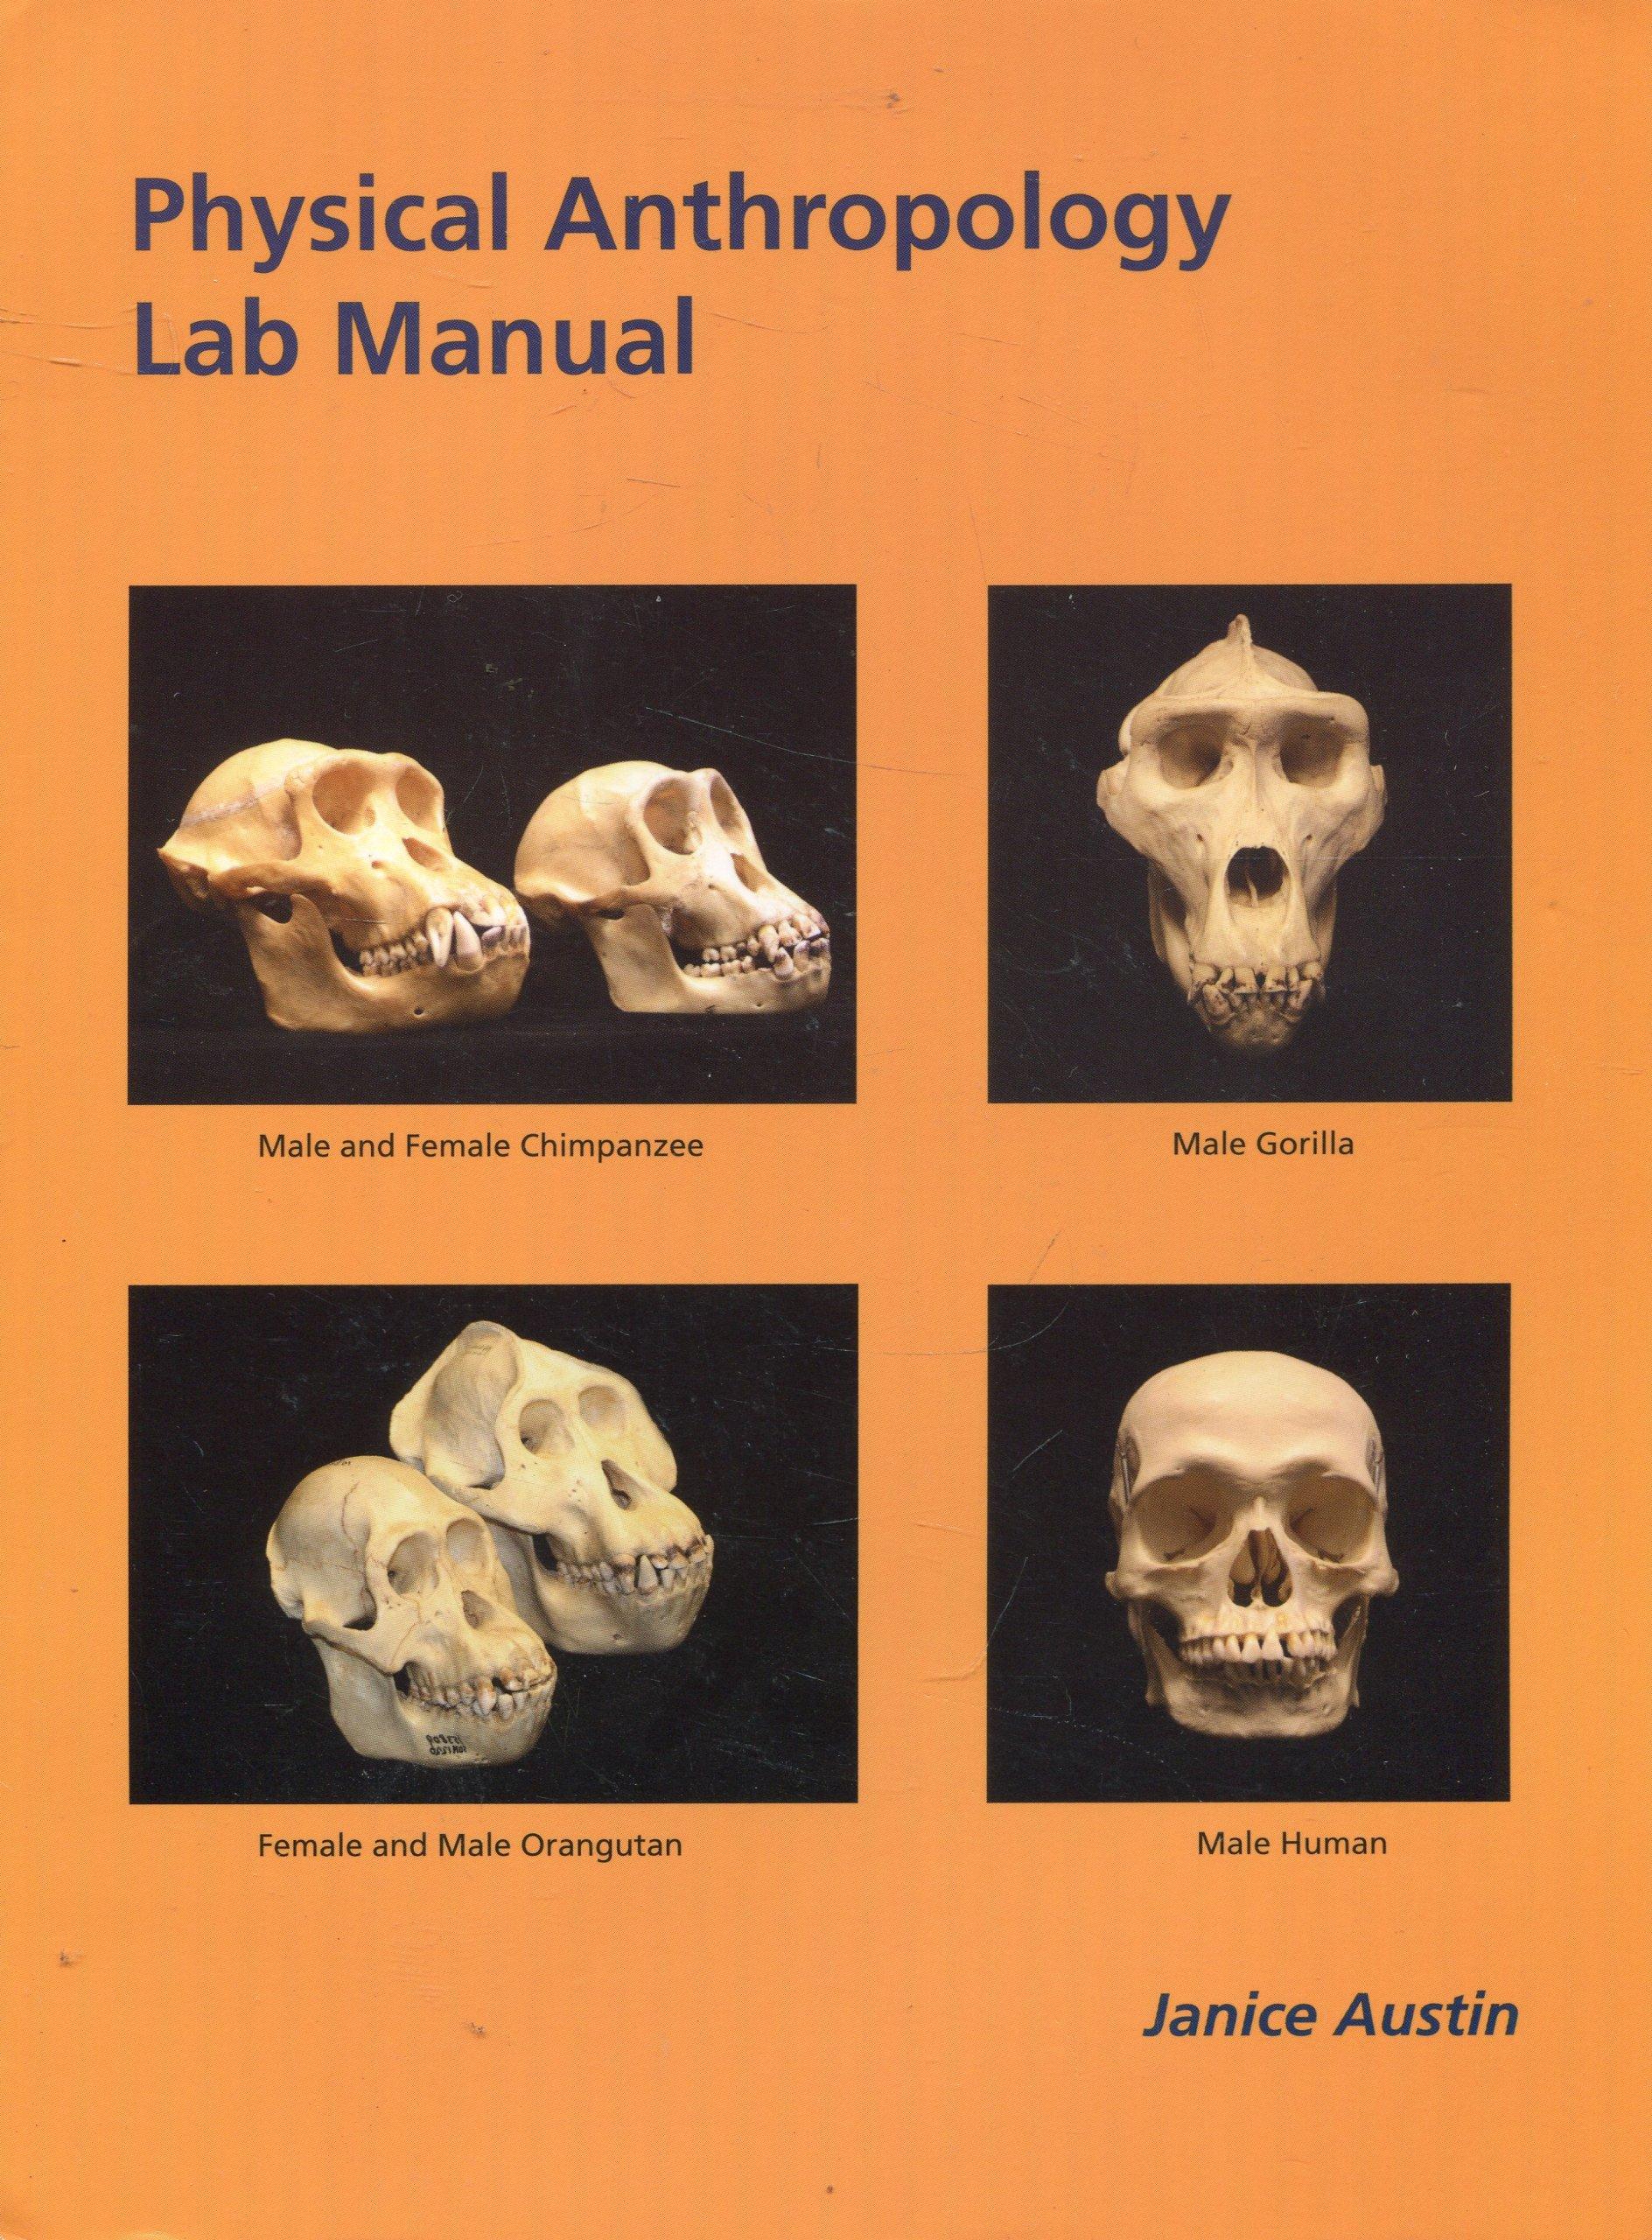 Physical Anthropology Lab Manual: Janice Austin: 9780972441926: Amazon.com:  Books